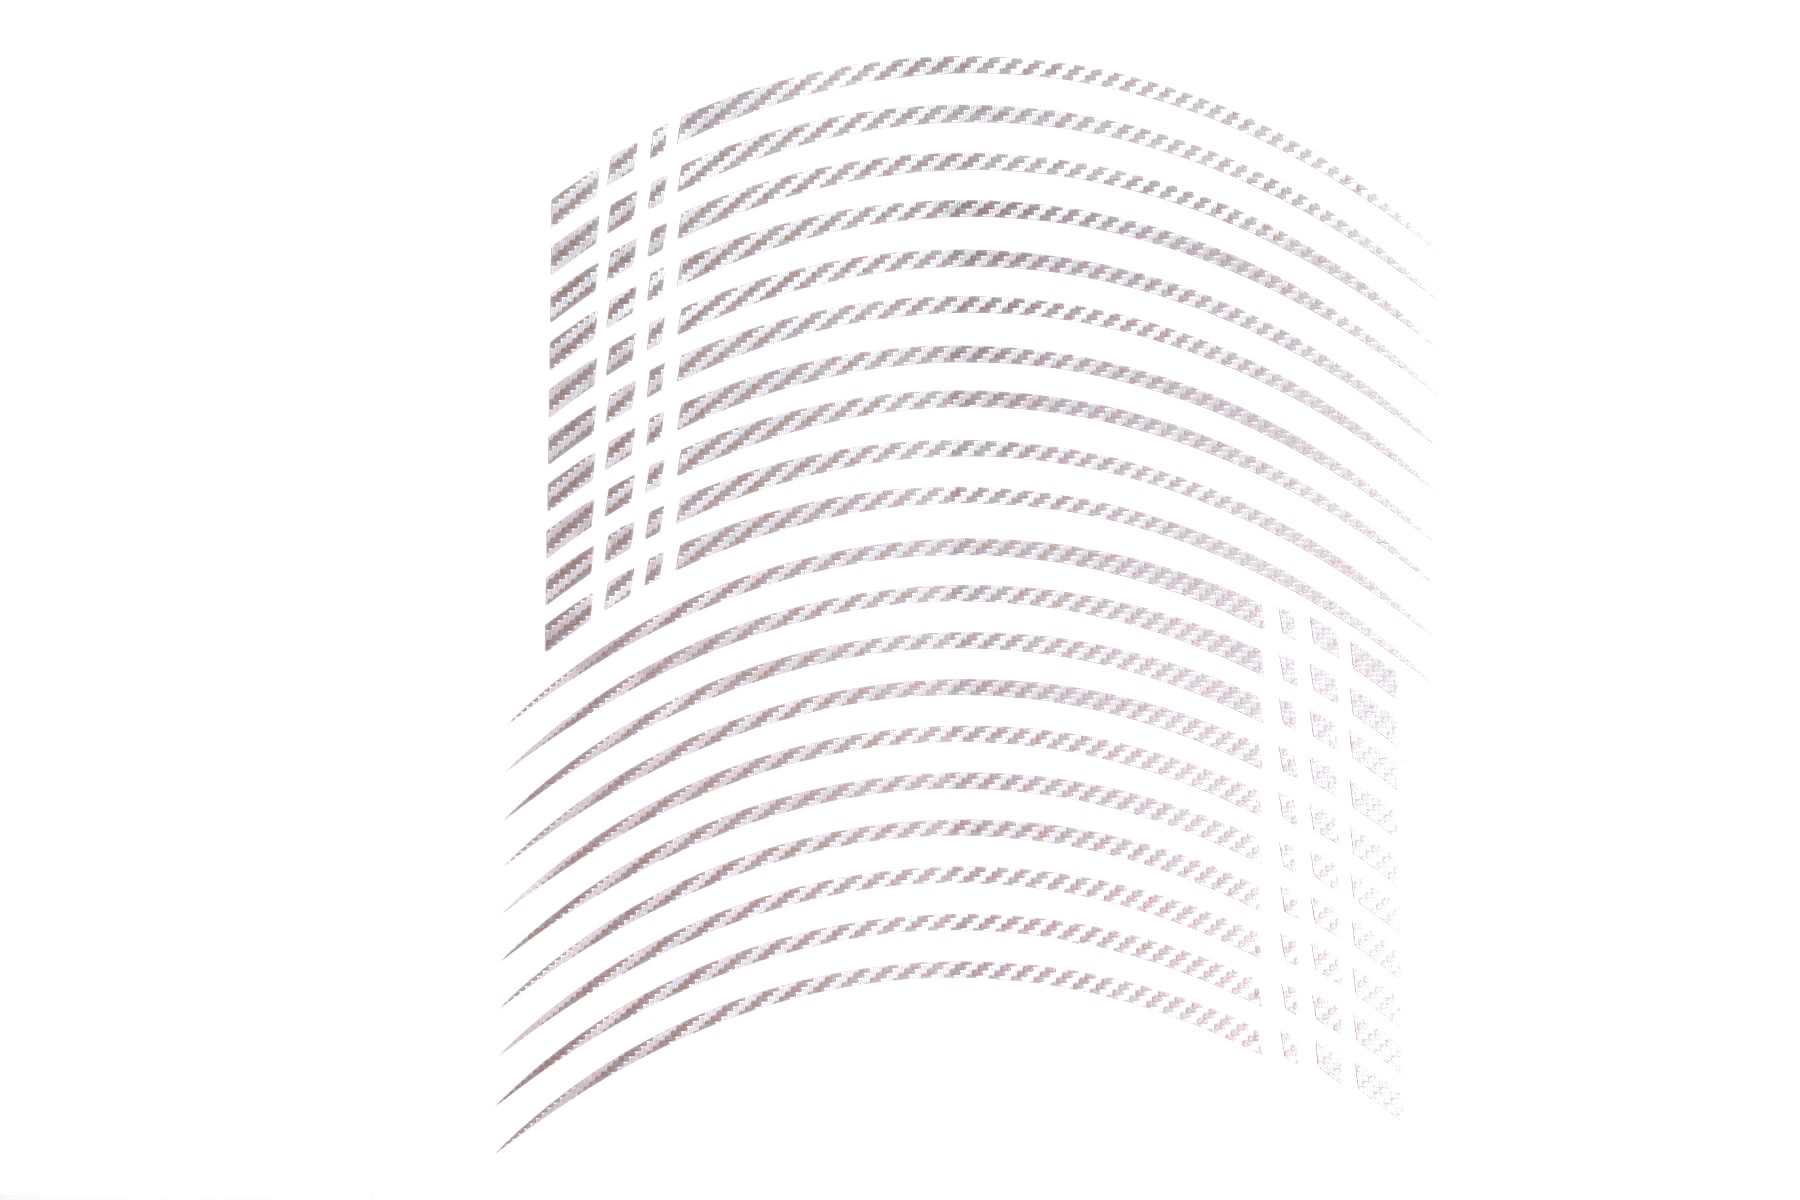 Gp2 18 Felgenaufkleber In Der Farbe Carbon Silber